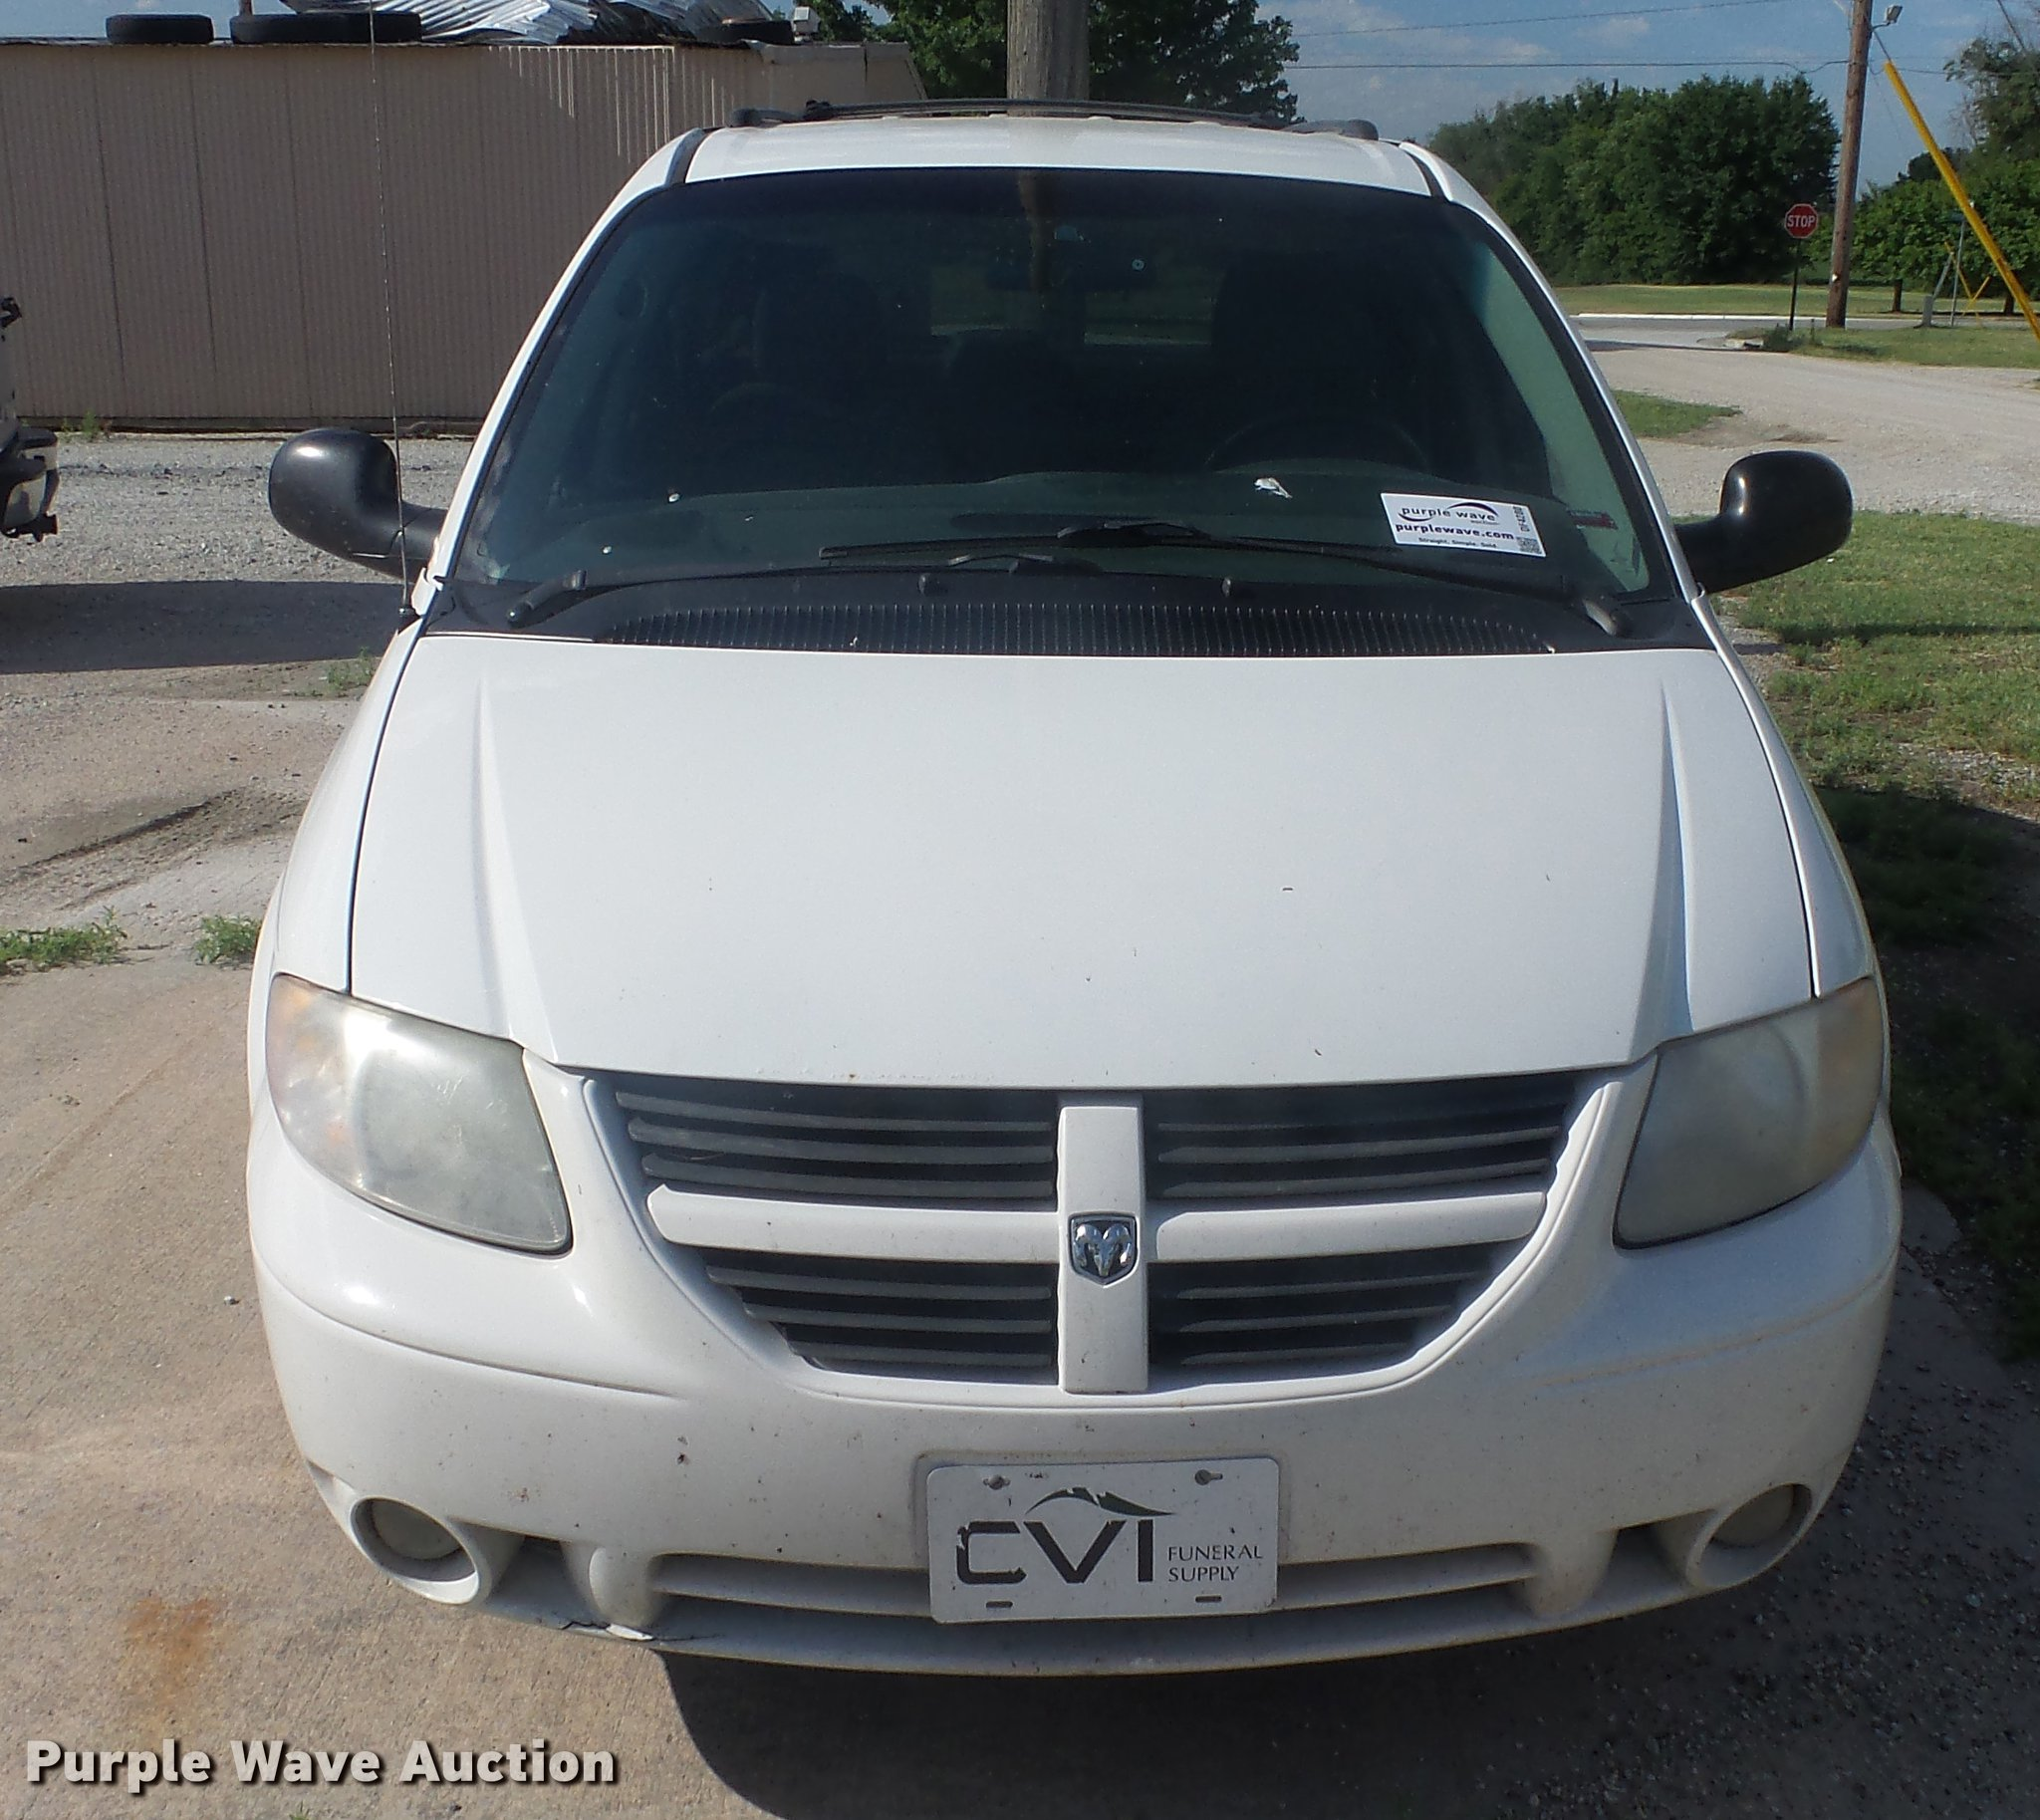 2006 Dodge Grand Caravan van   Item DF4280   SOLD! August 1